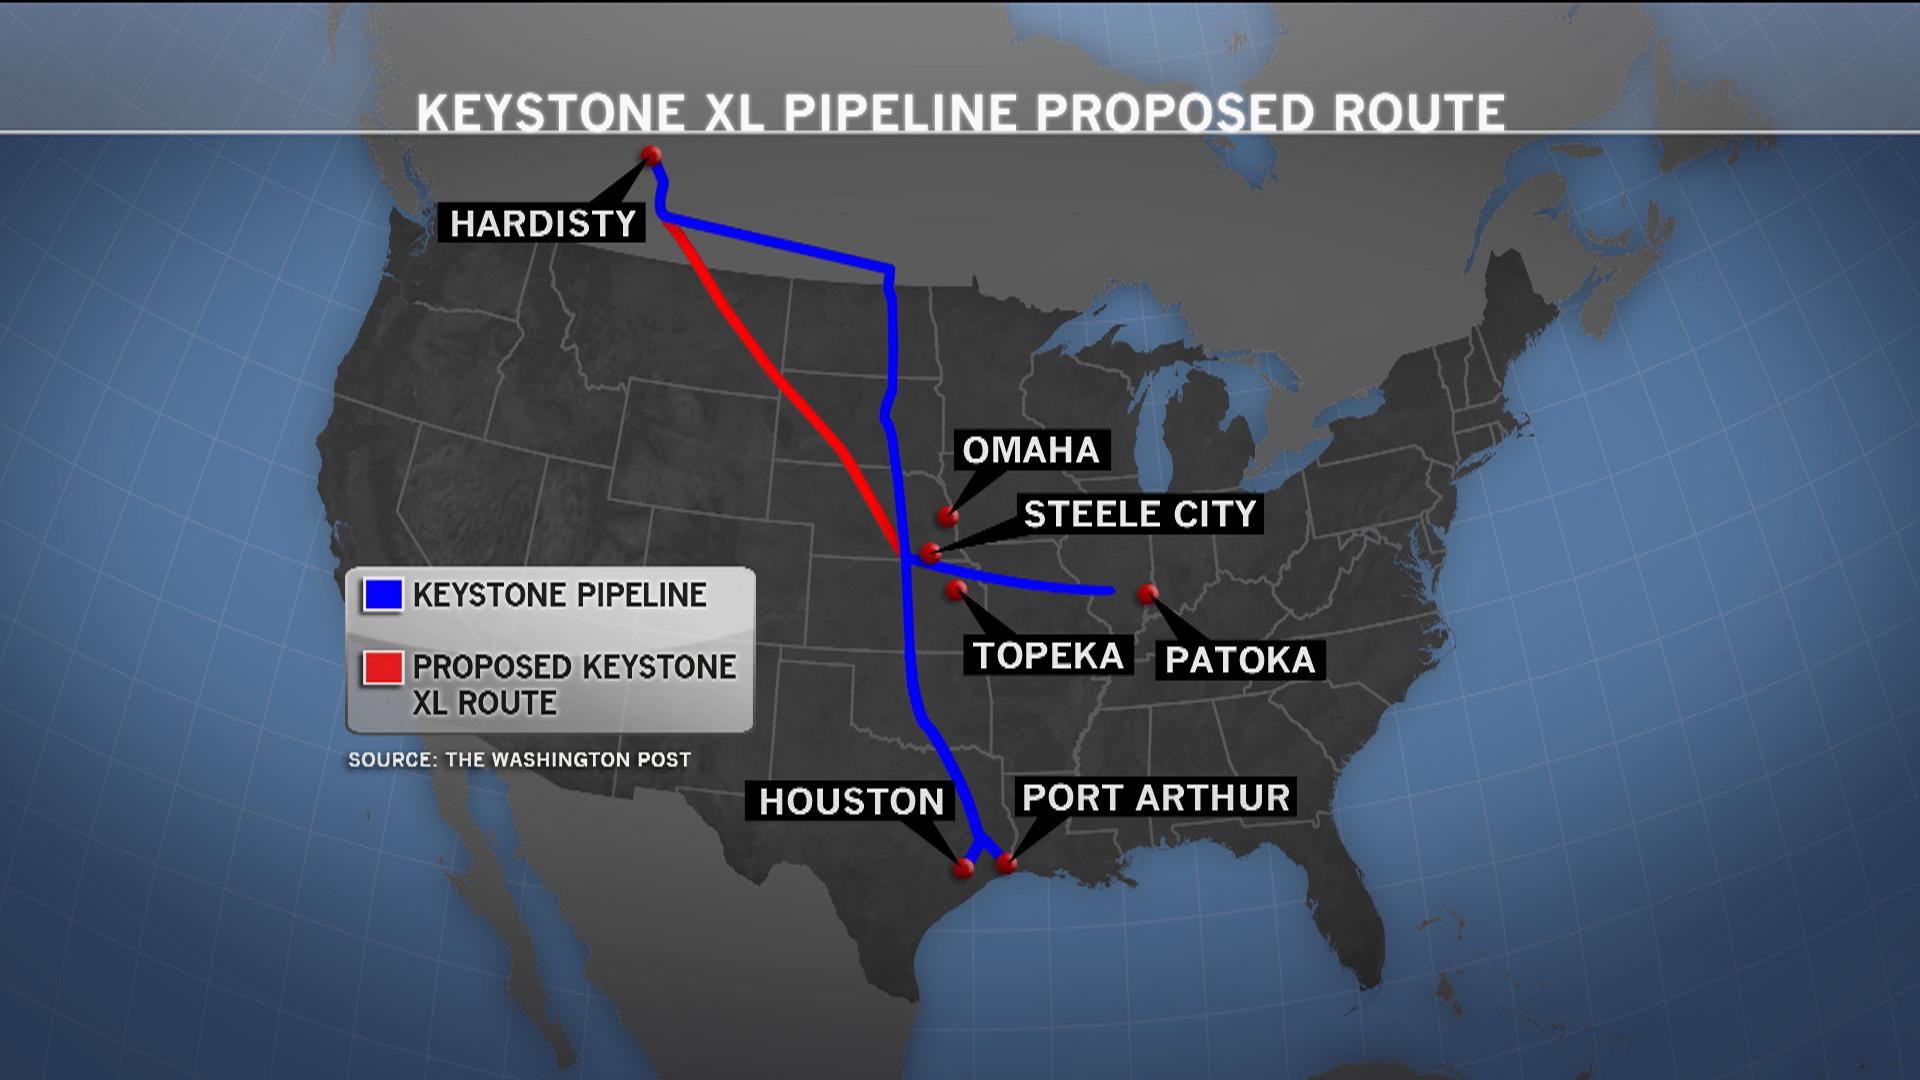 Future of Keystone Pipeline in question